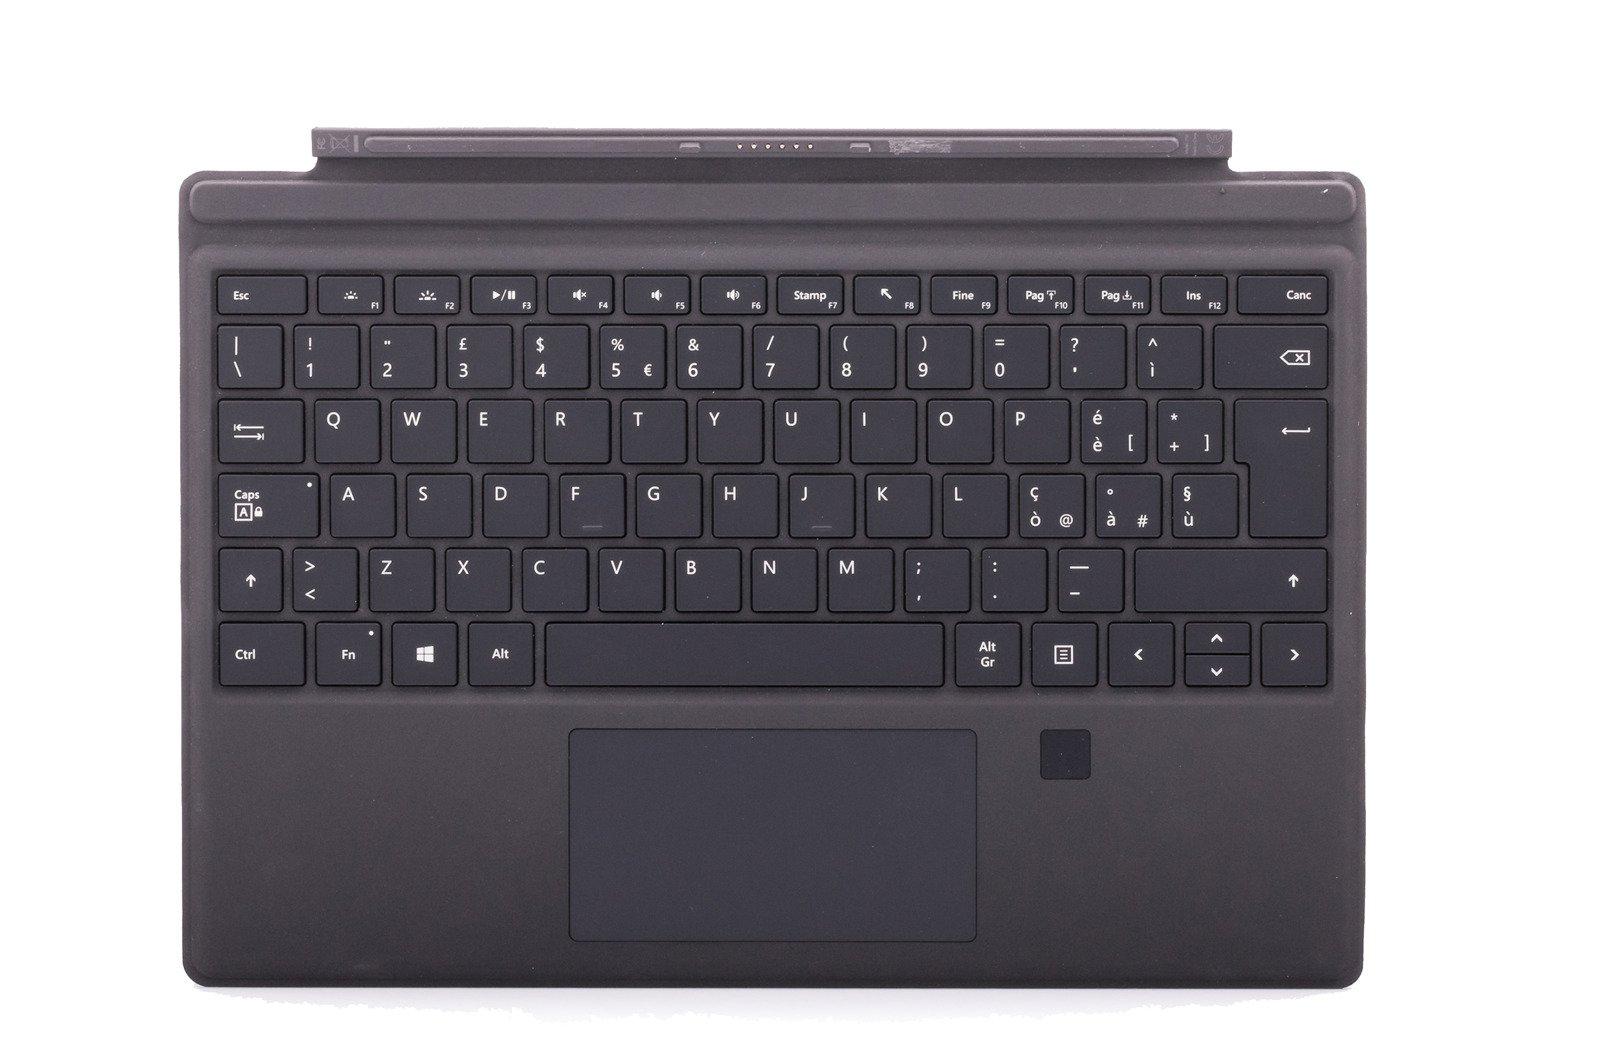 Keyboard Surface Type Cover Pro 4 Finger ID Black Grade A (Italian)